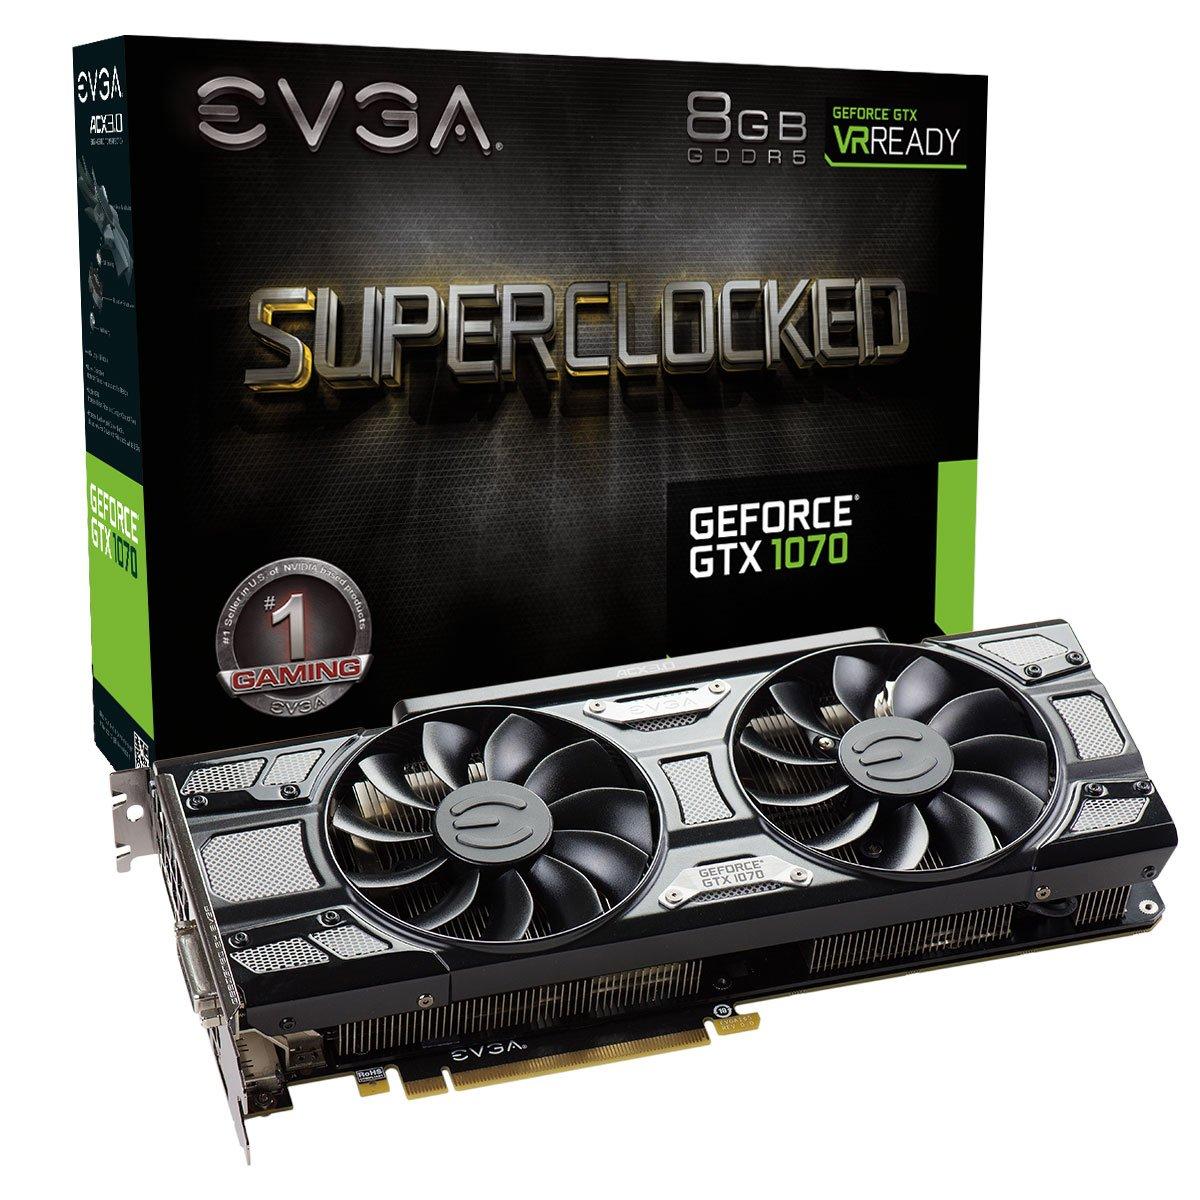 EVGA GeForce Grafikkarte amazon